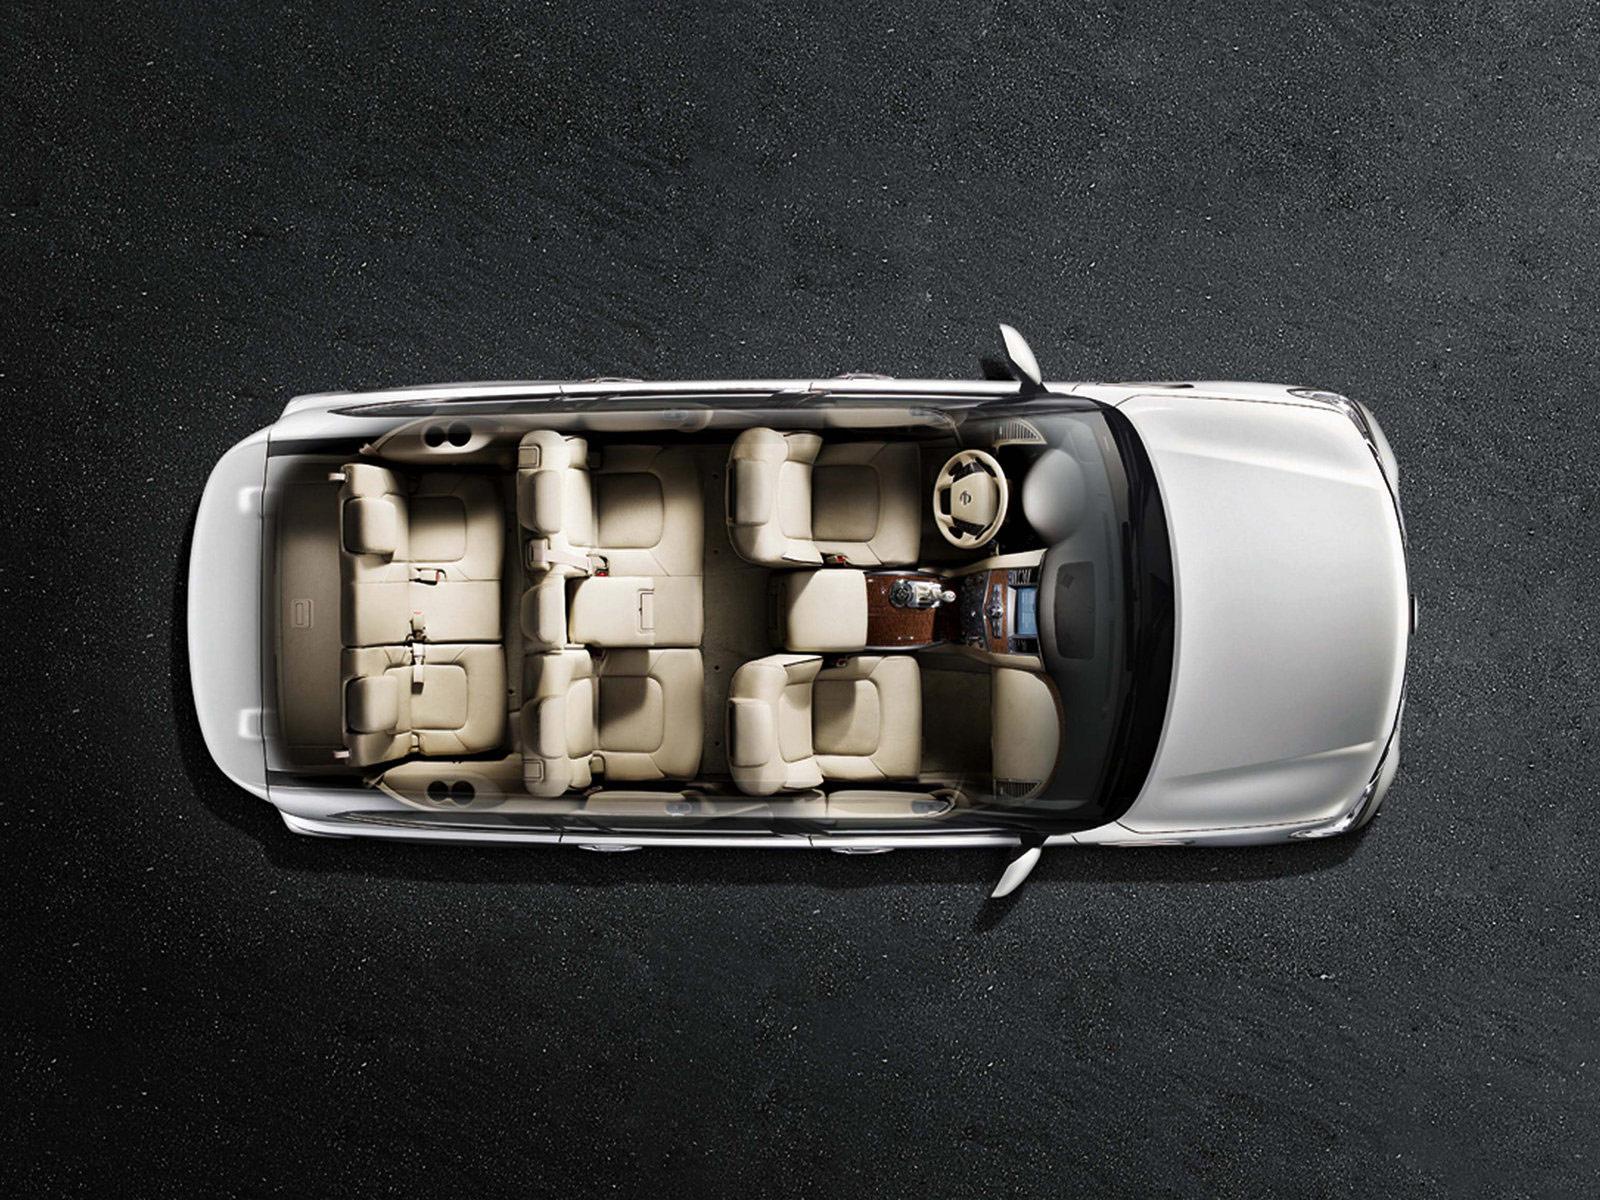 Nissan Patrol Cars Show